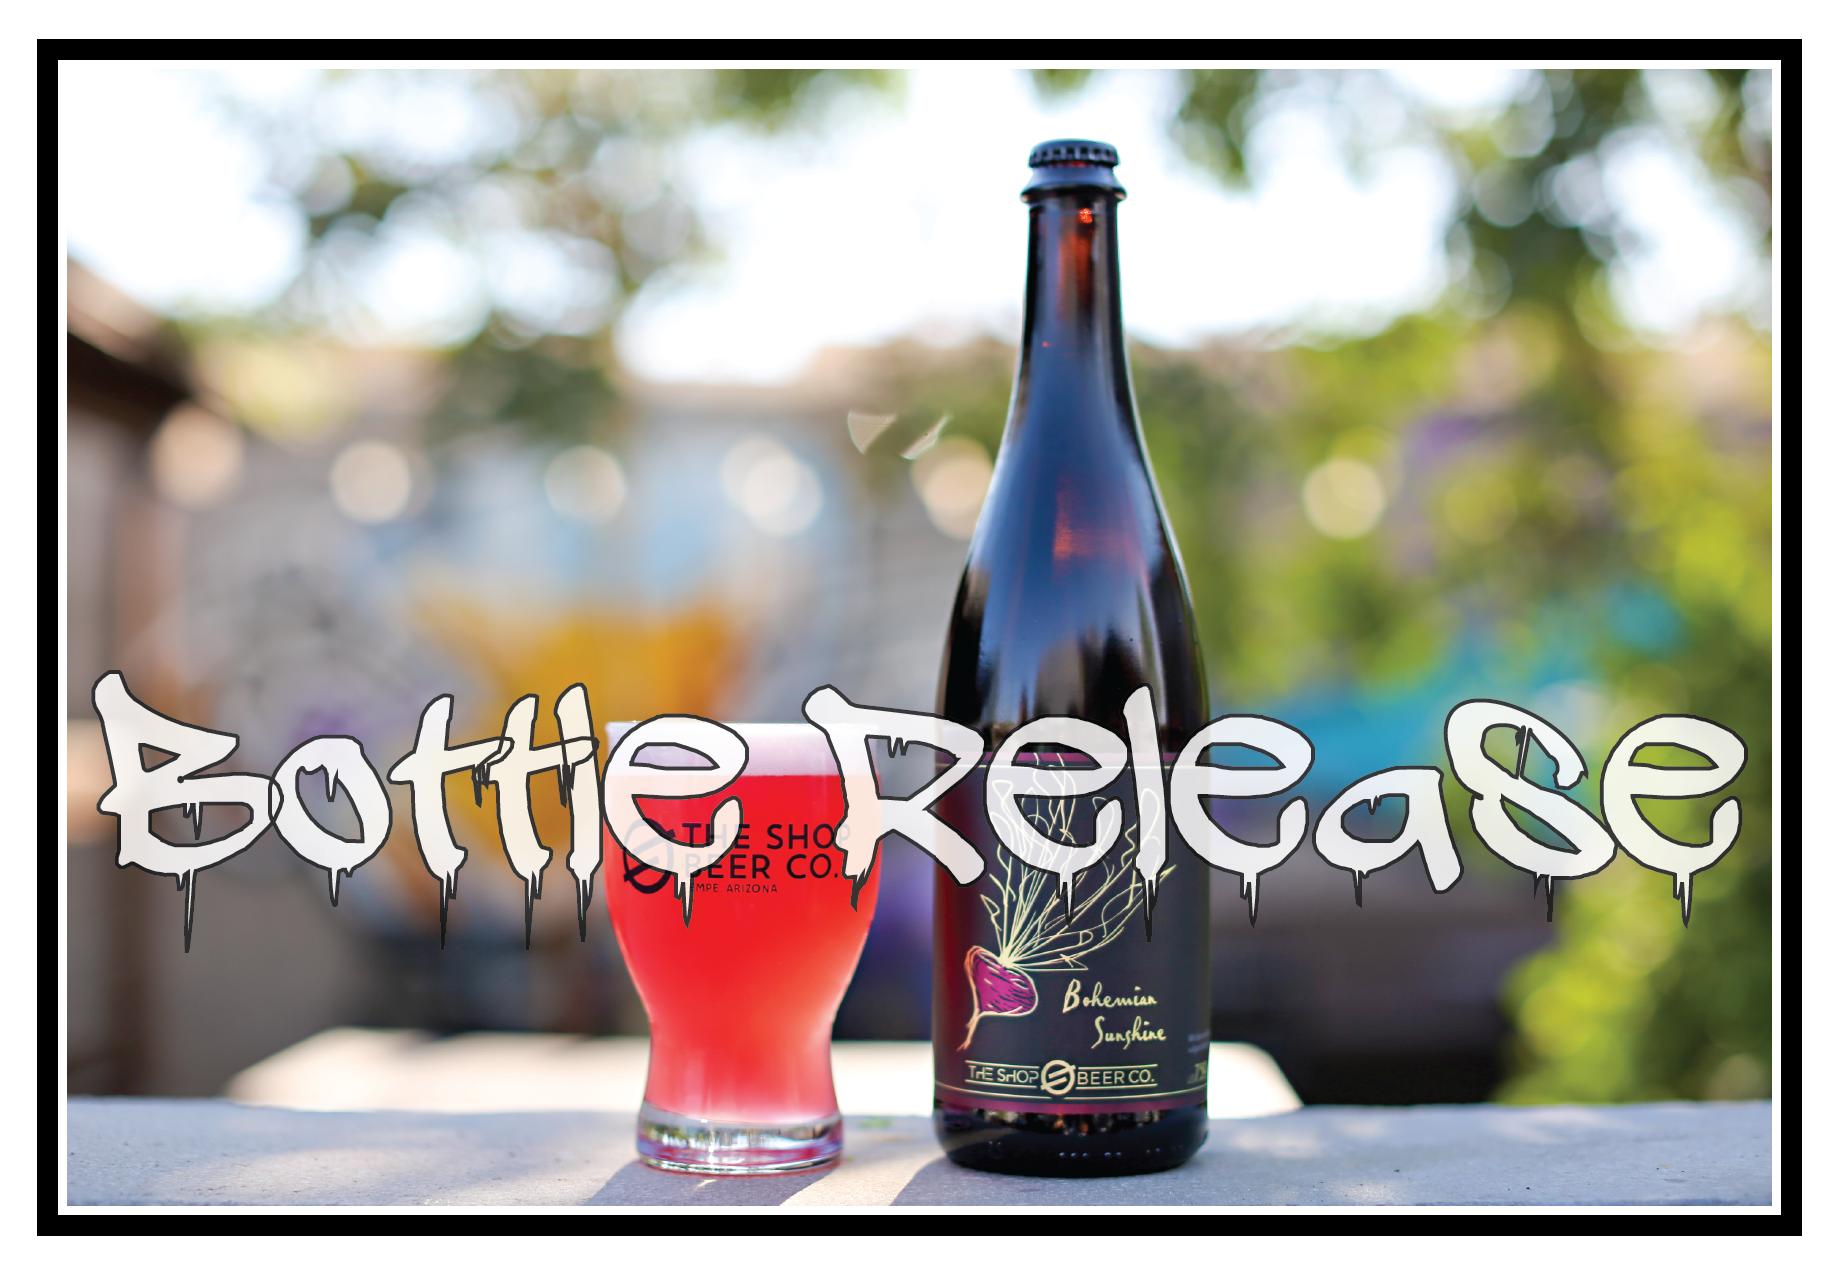 Website_Button_Bottle Release.png